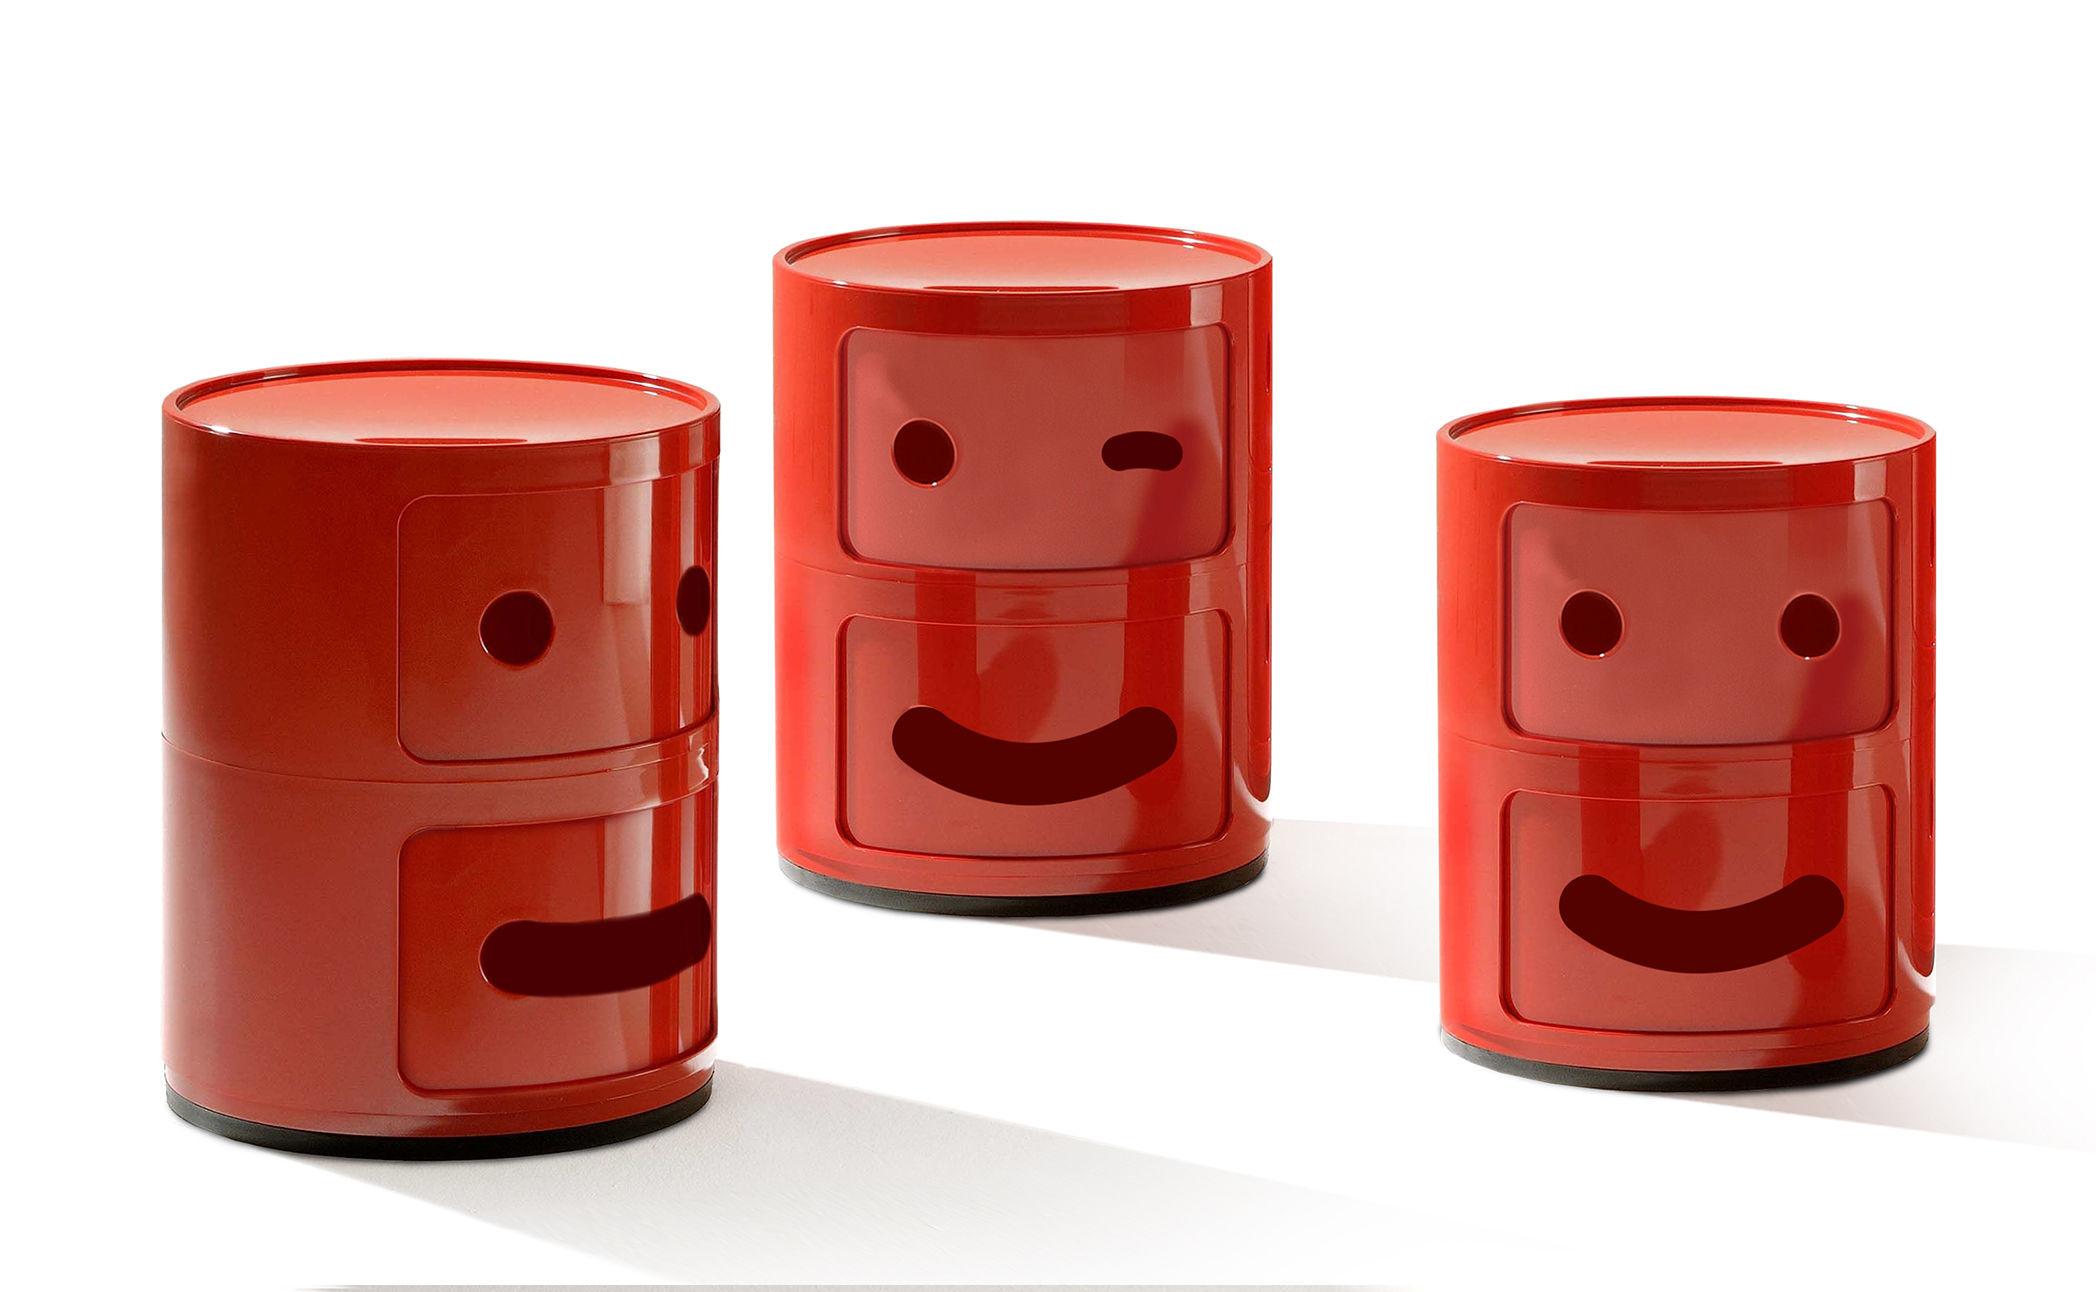 Smile Μονάδα αποθήκευσης Componibili Αρ. 3 / 2 συρτάρια Red Kartell Anna Castelli Ferrieri | Fabio Novembre 2